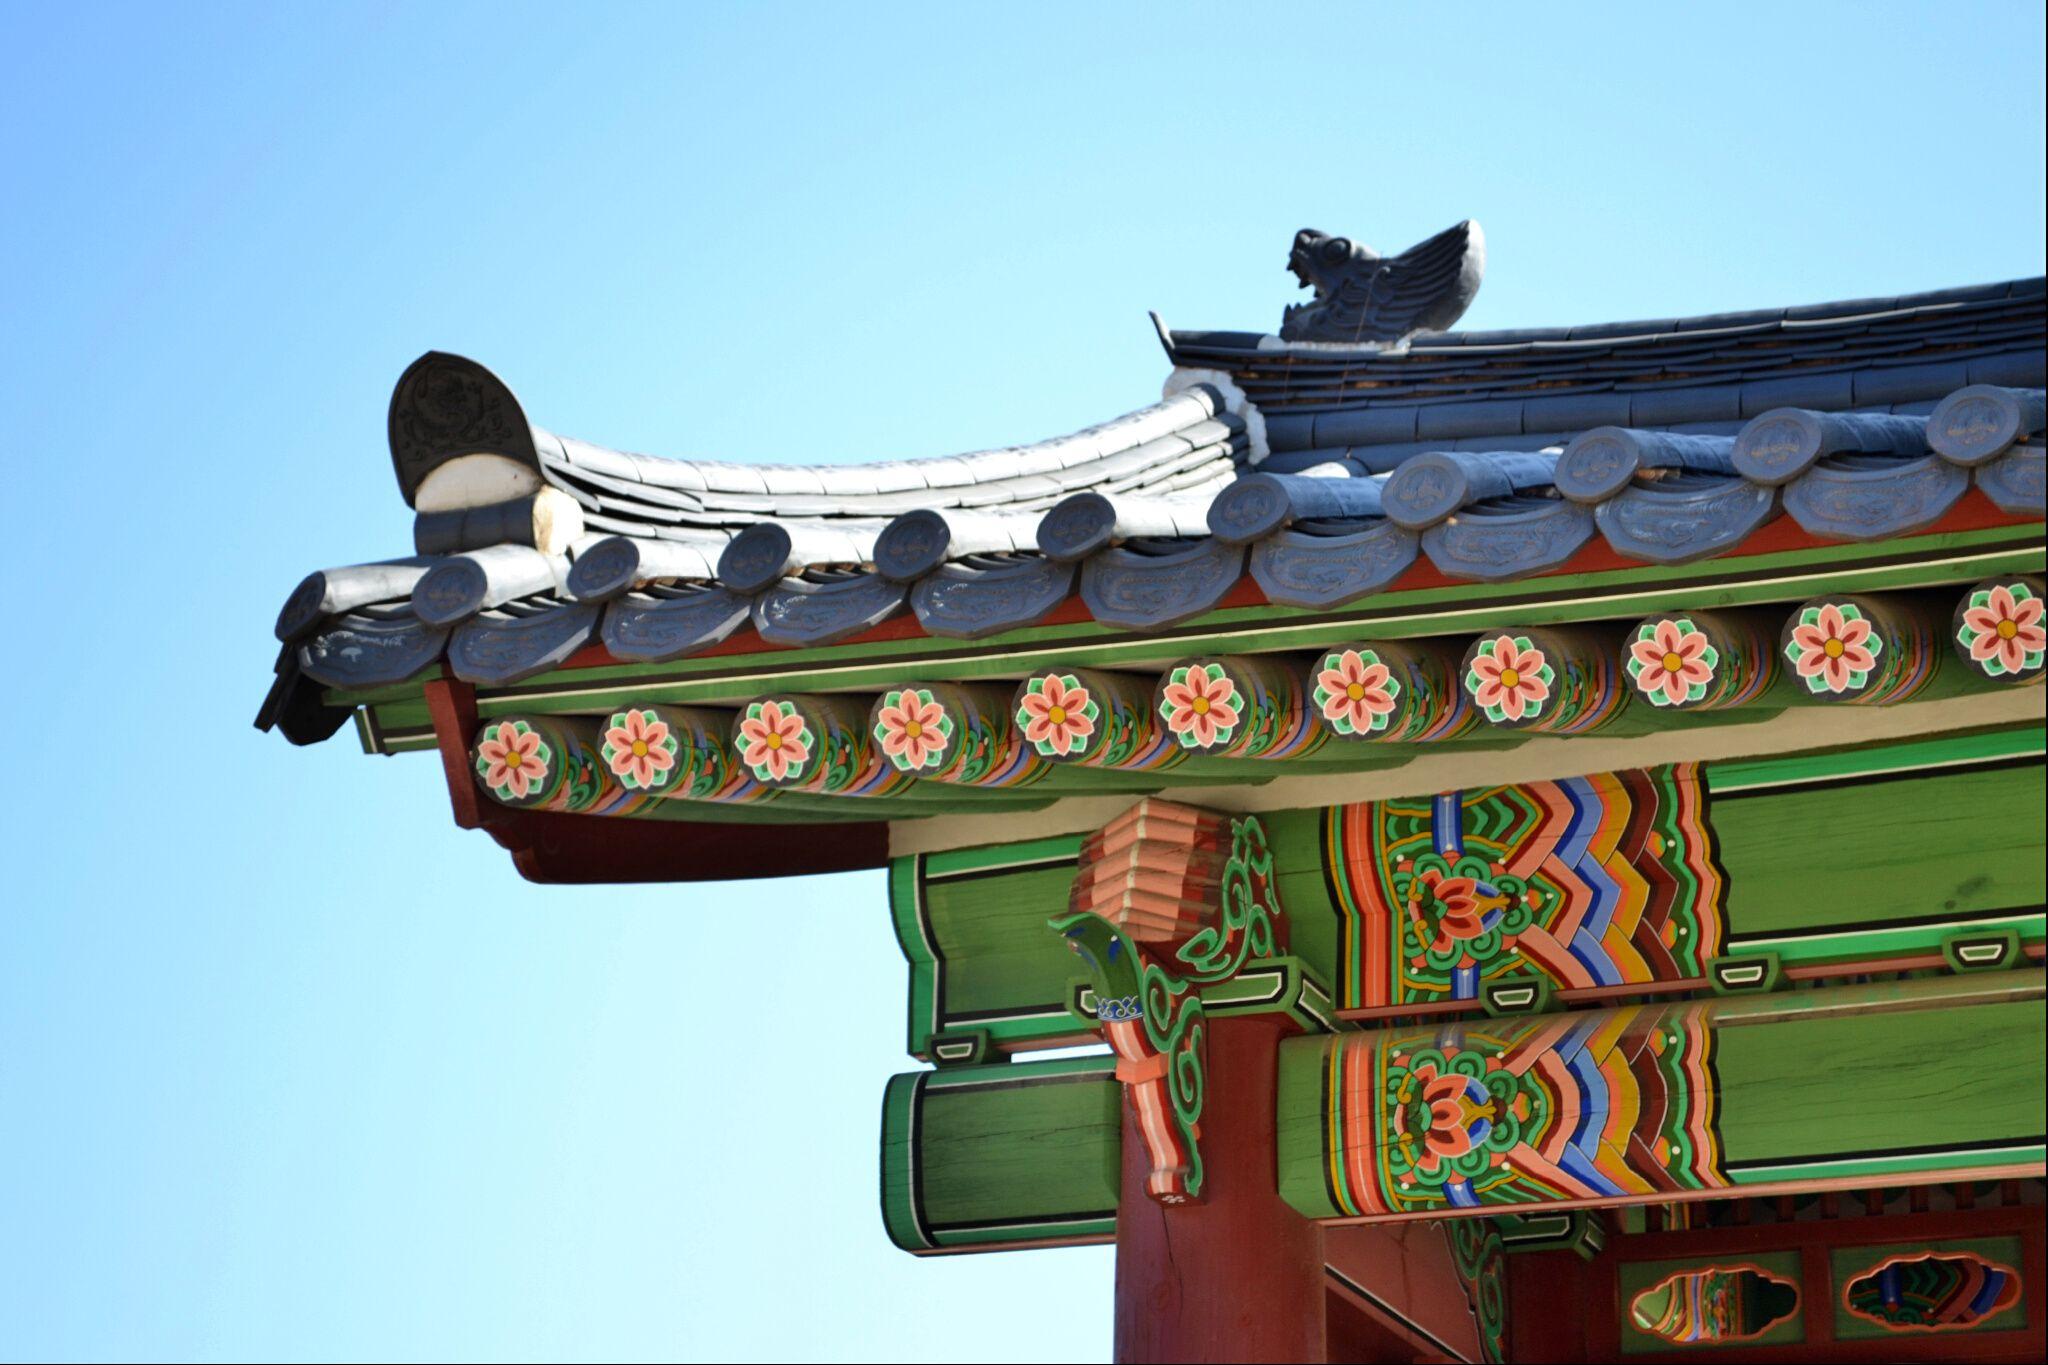 SOKOR '14: Colors and details. Gyeongbokgung Palace (Seoul, Korea)